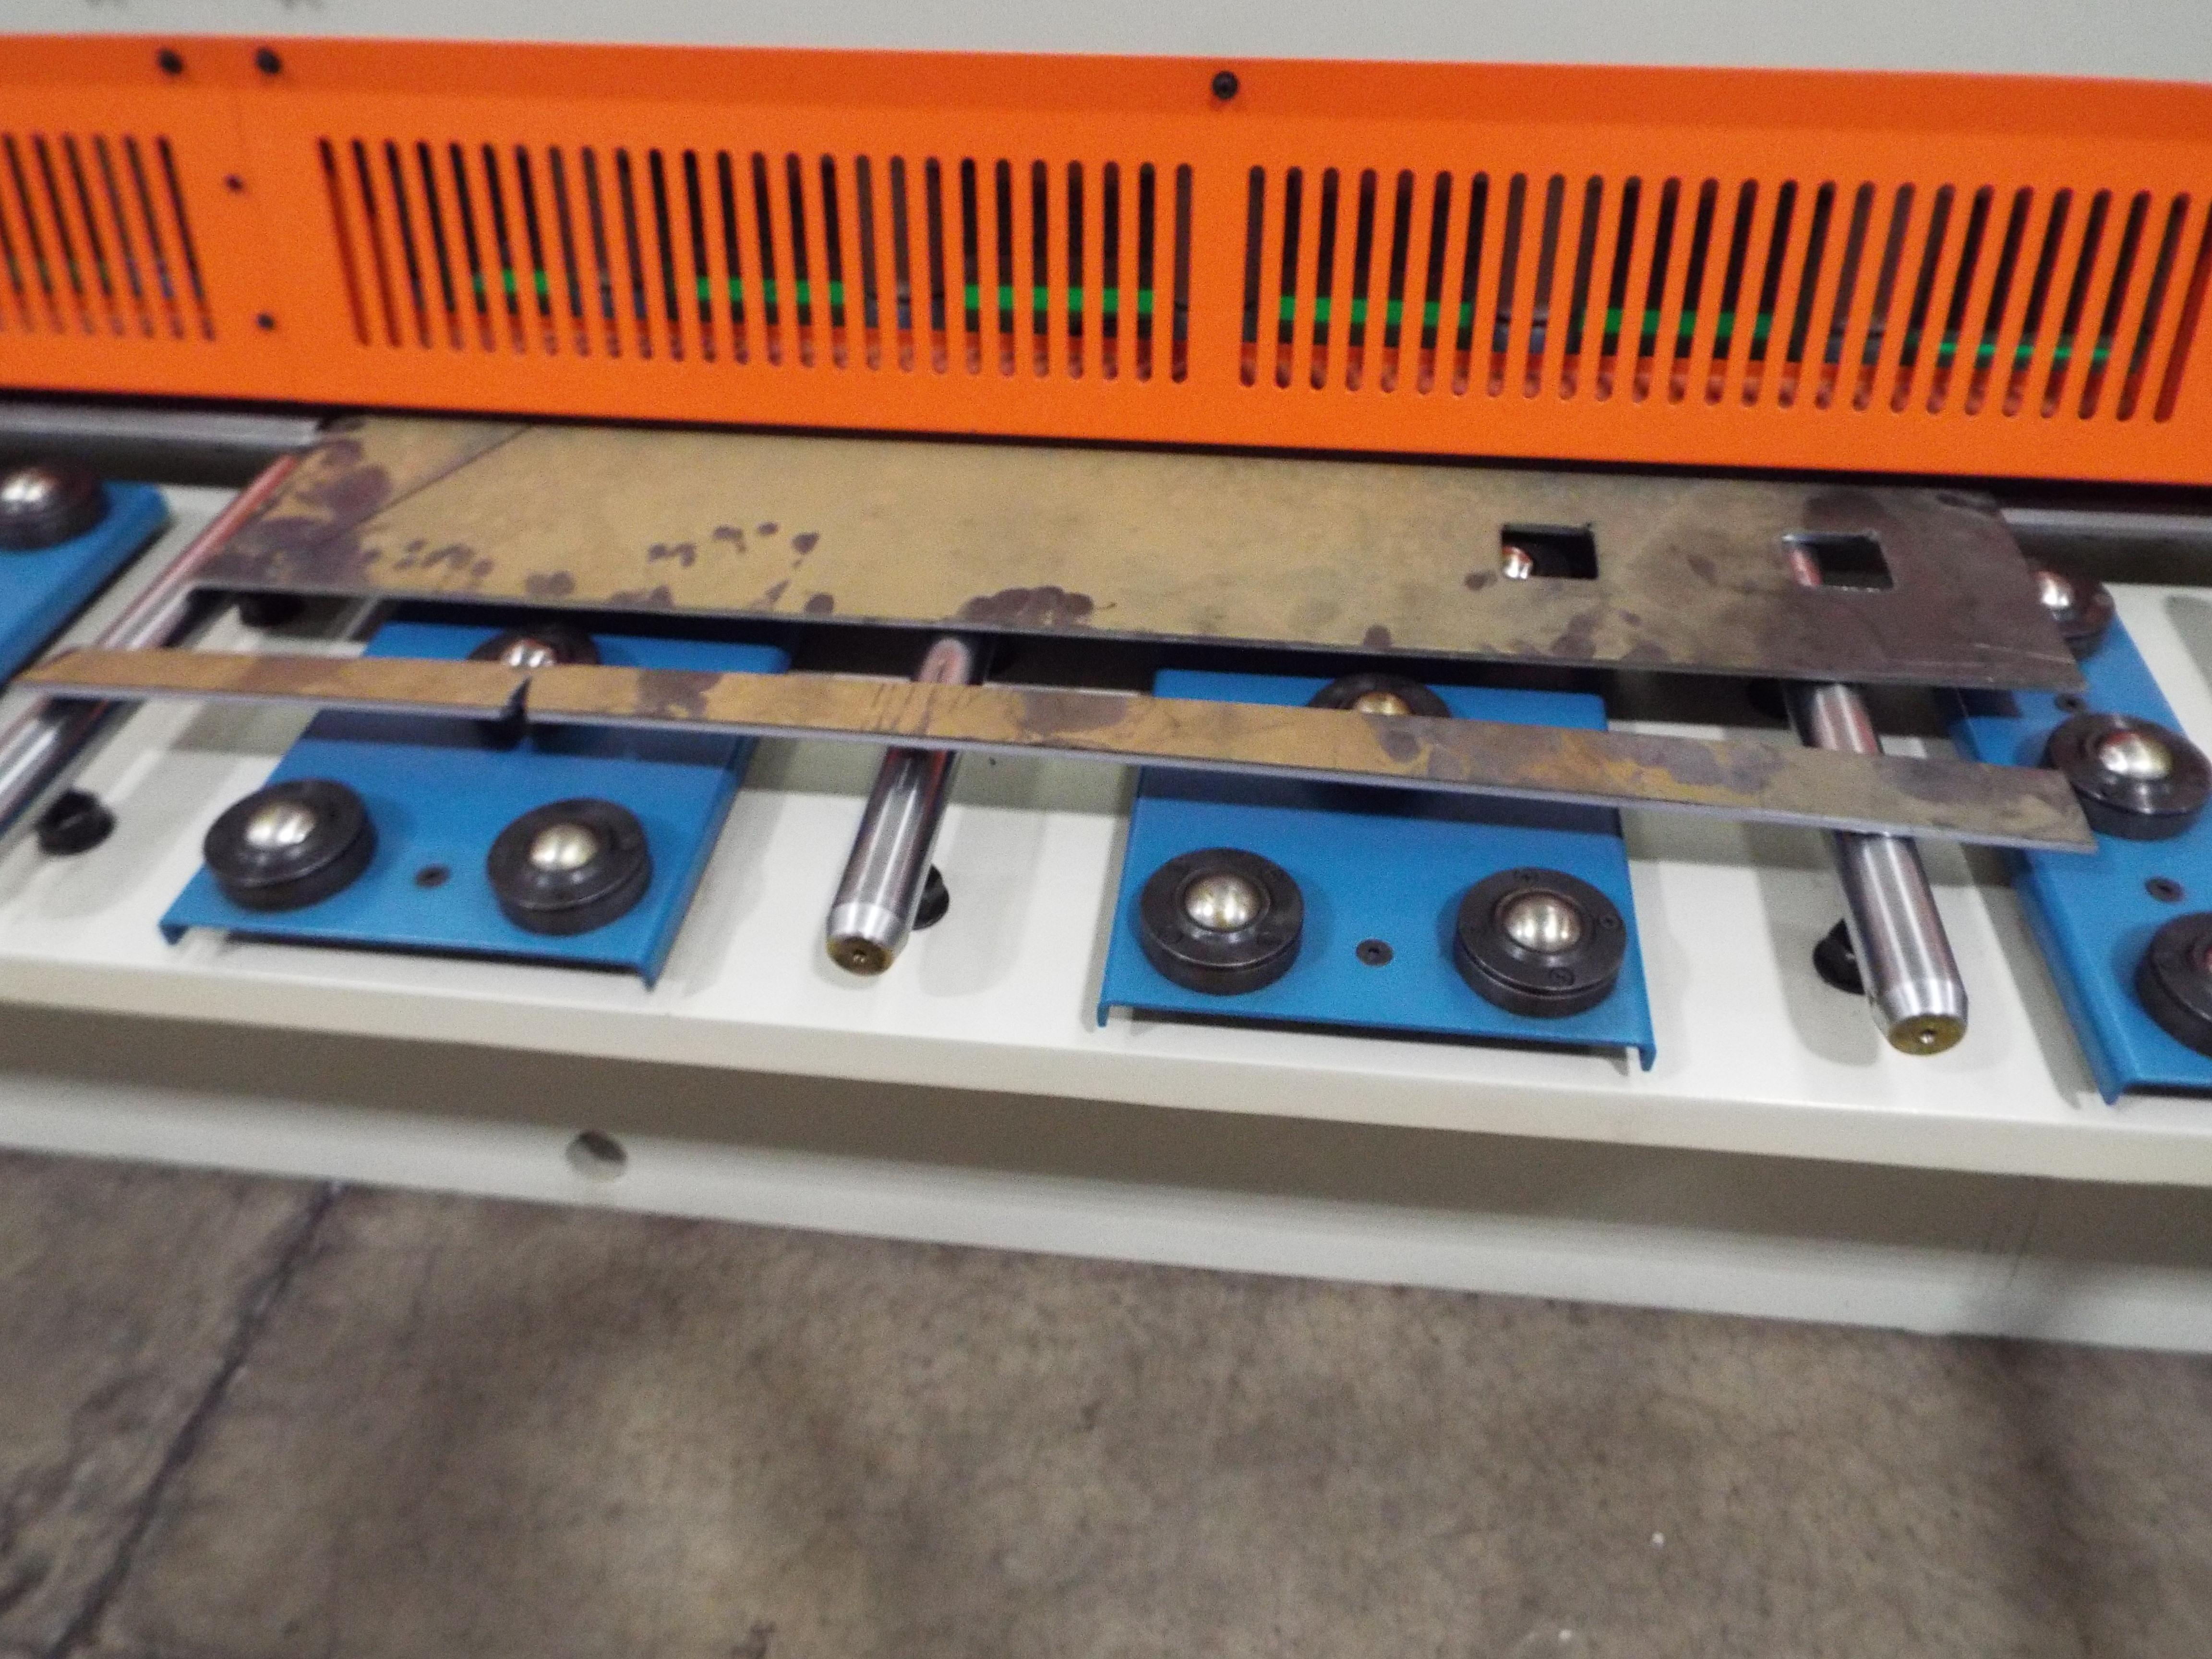 Lot 4 - Baileigh Hydraulic Shear - Type SH-120500HD